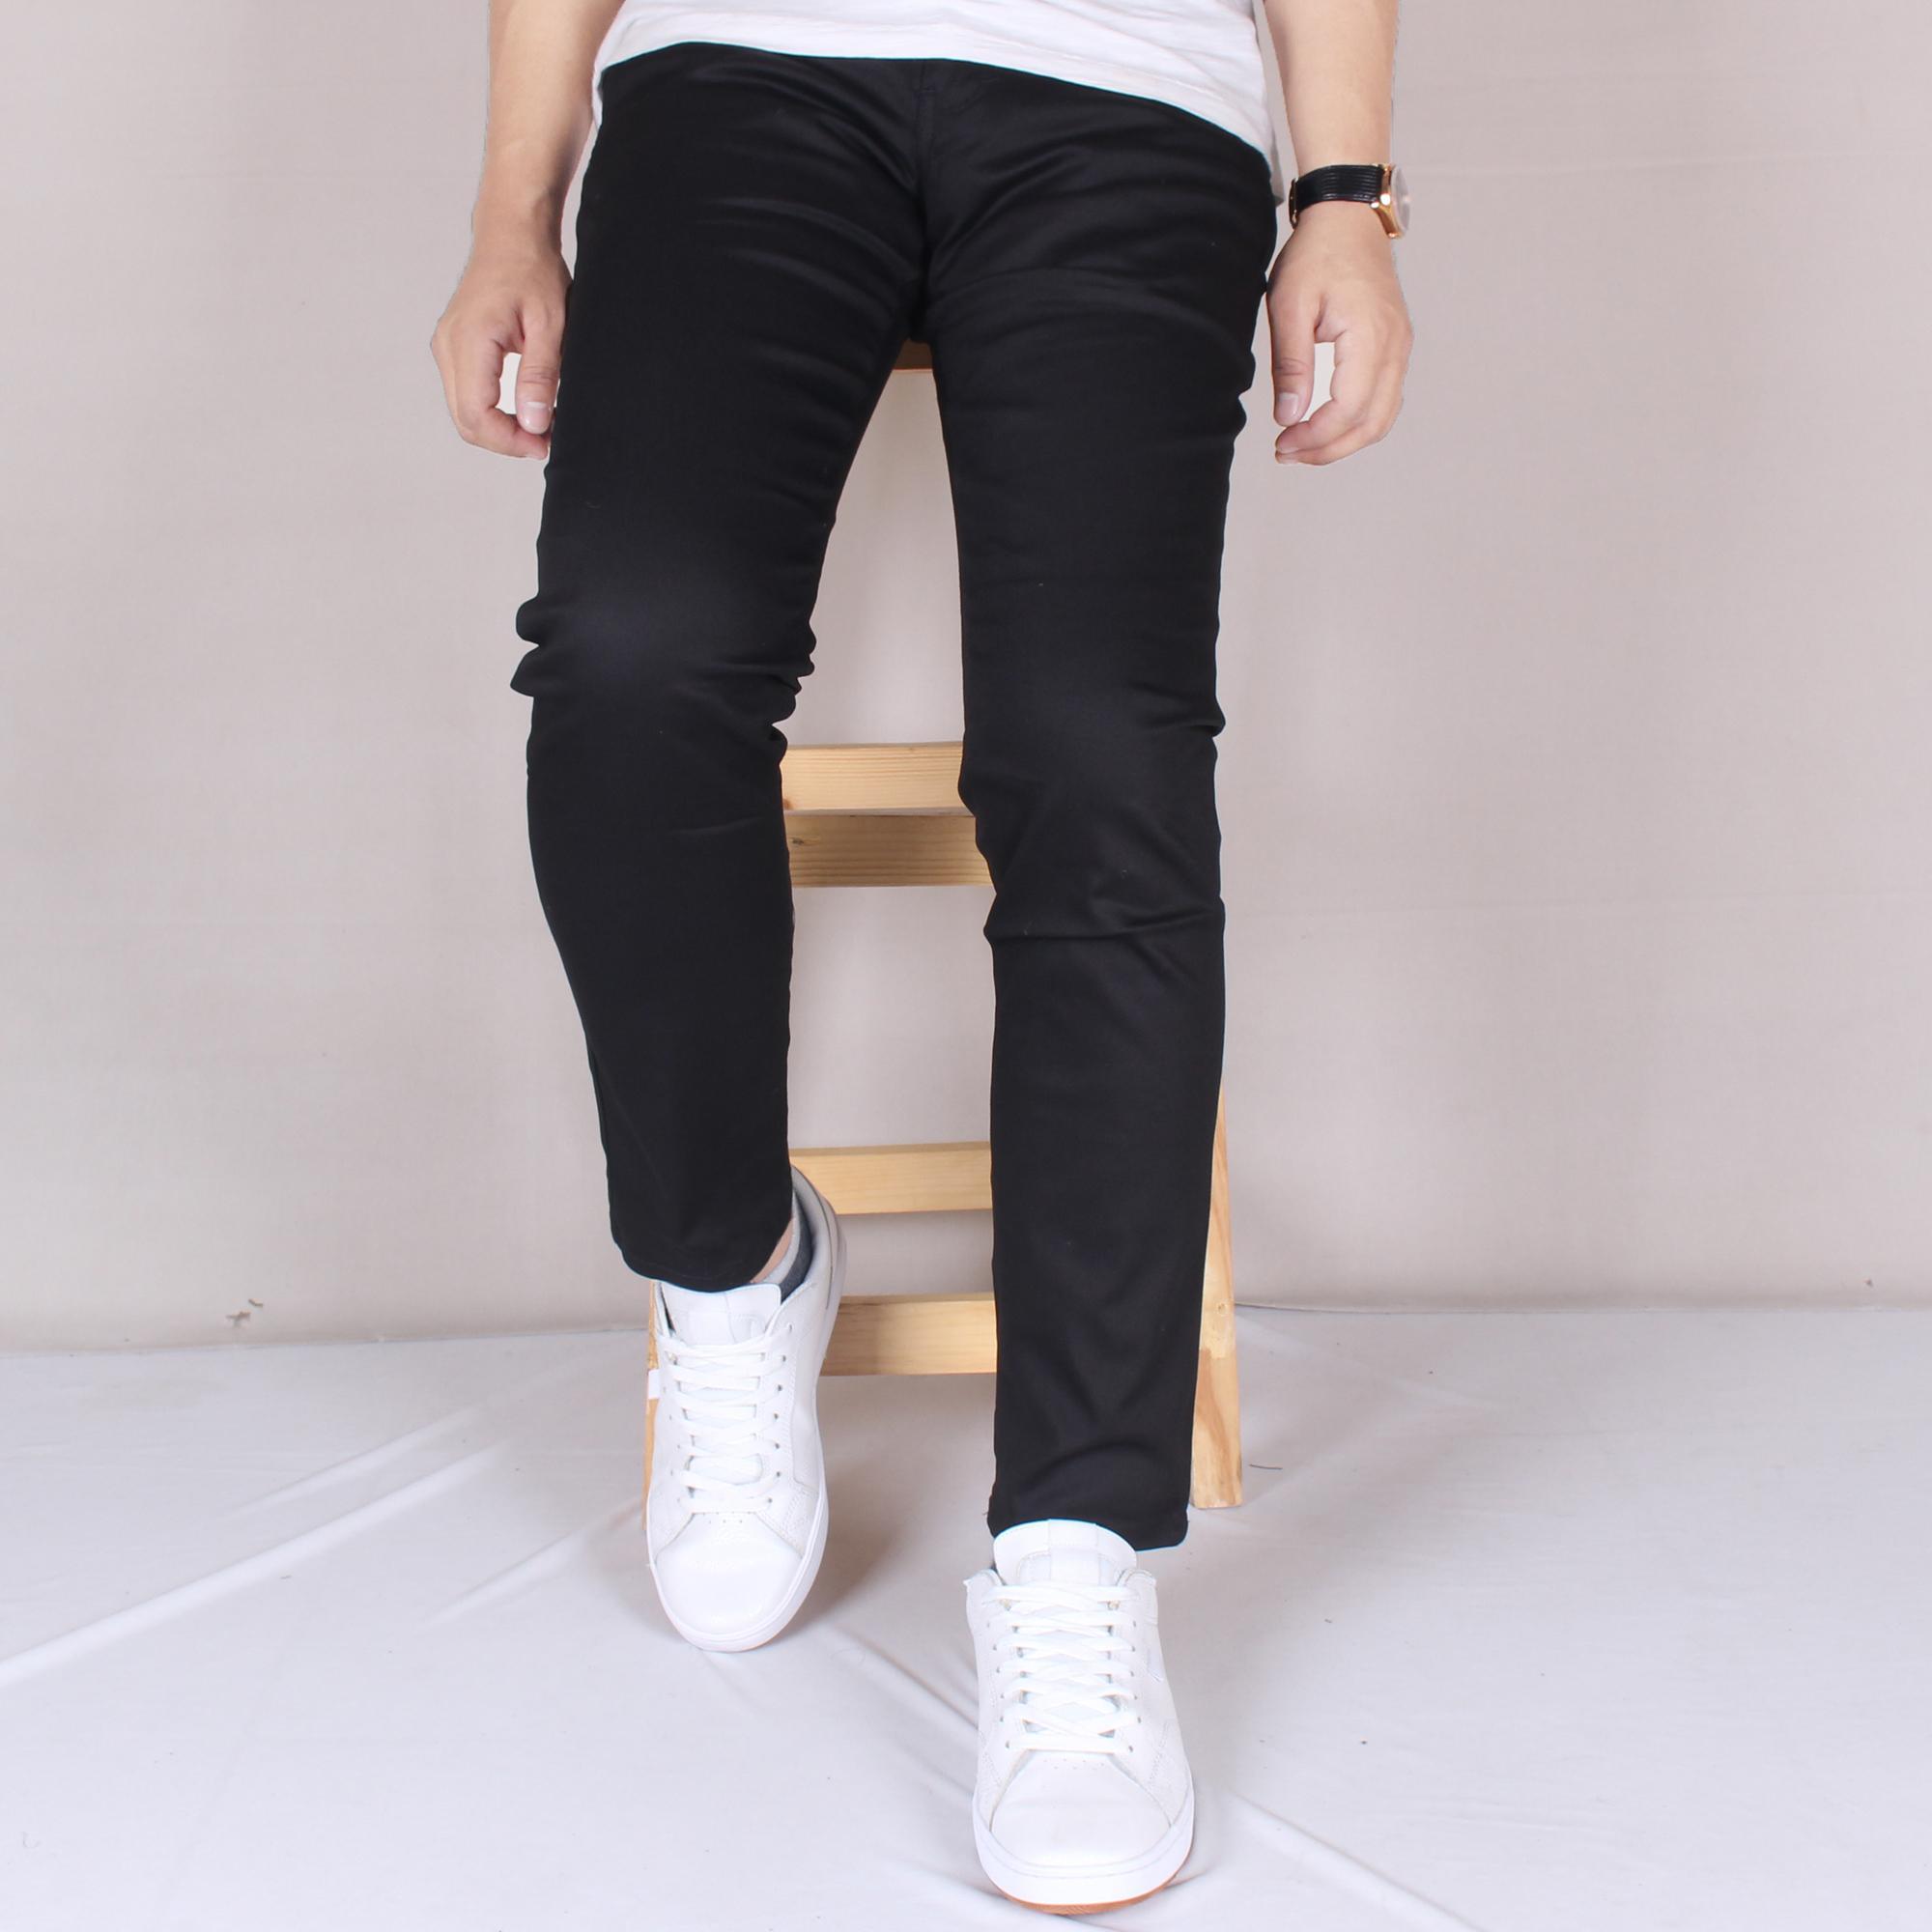 ... Zs-fashion 6014 Celena Jeans Panjang Pria Celana Chino Skinny Cowok Washing Black Celana Jeans